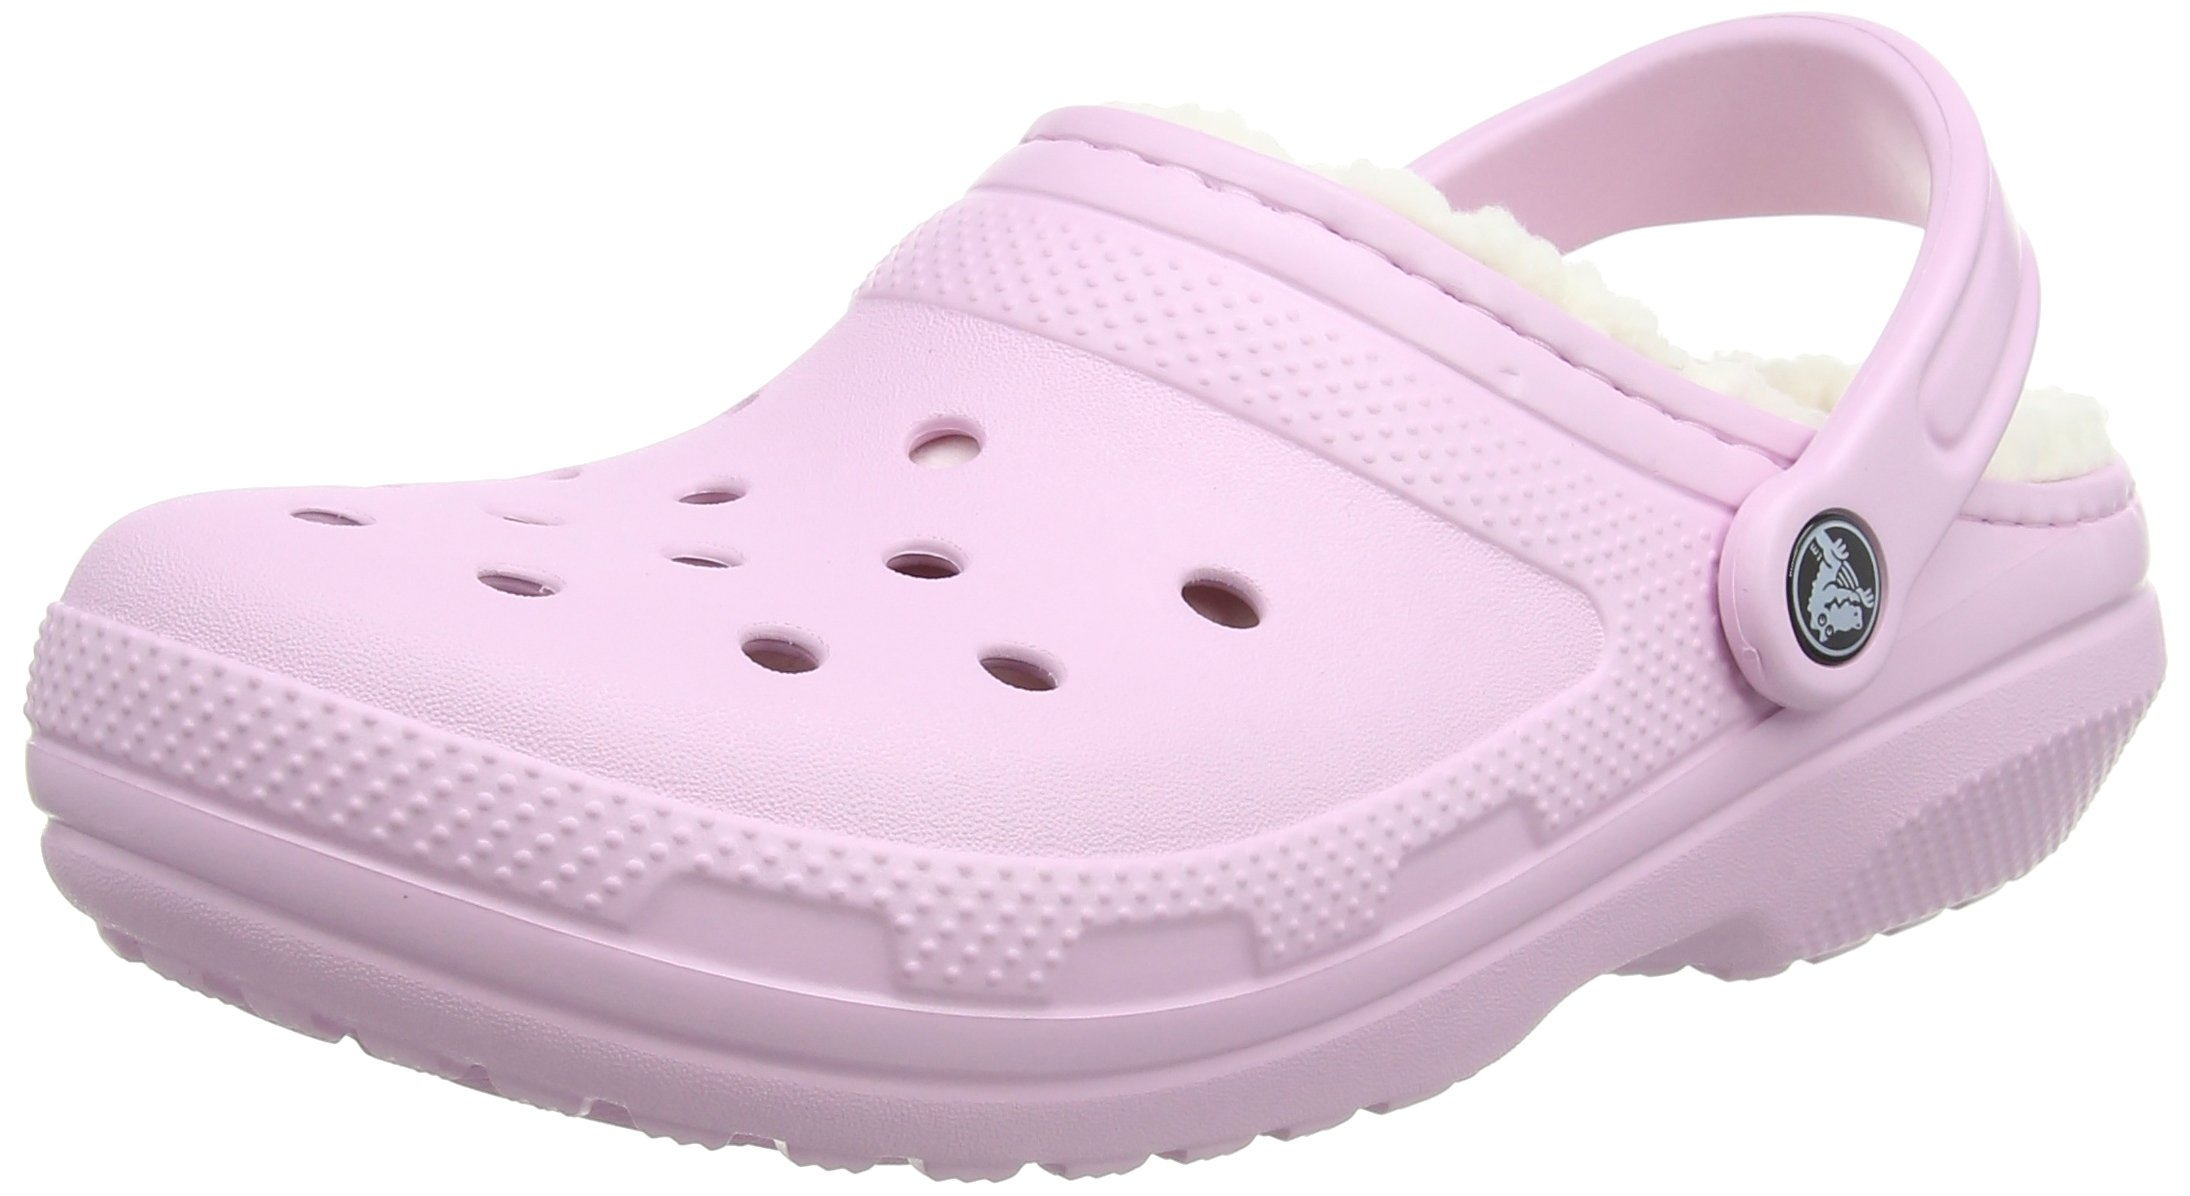 Crocs Unisex Classic Lined Clog,Ballerina Pink/Oatmeal,11 US Men / 13 US Women